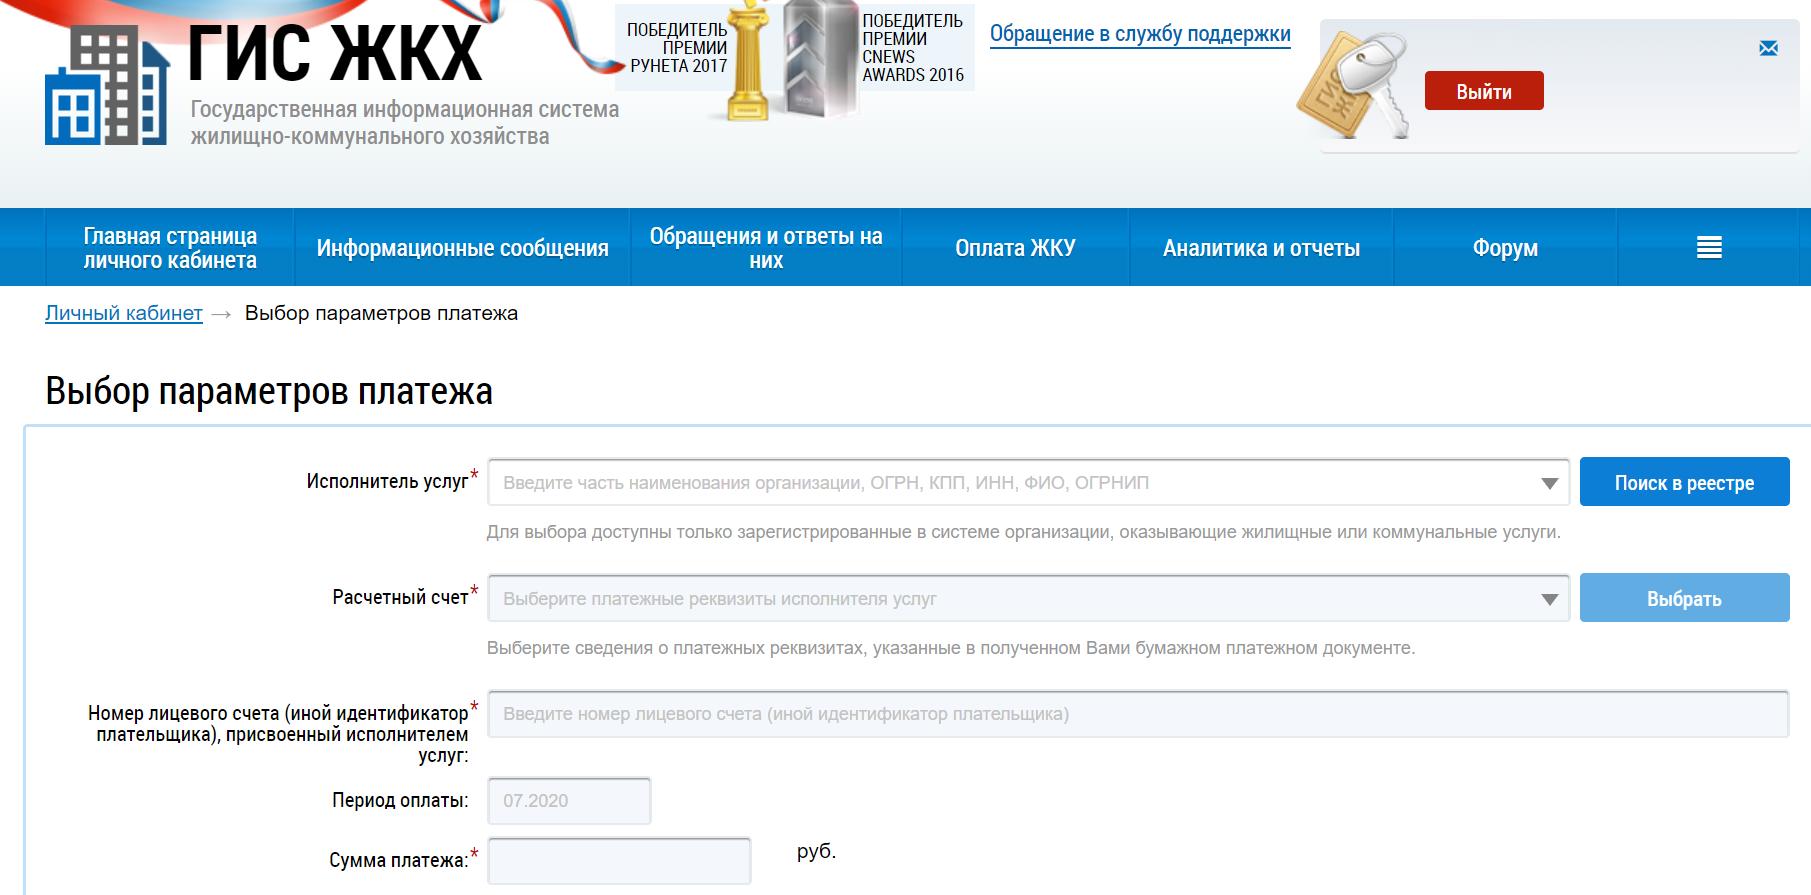 Оплата жкх через гис gkh-tarif.ru